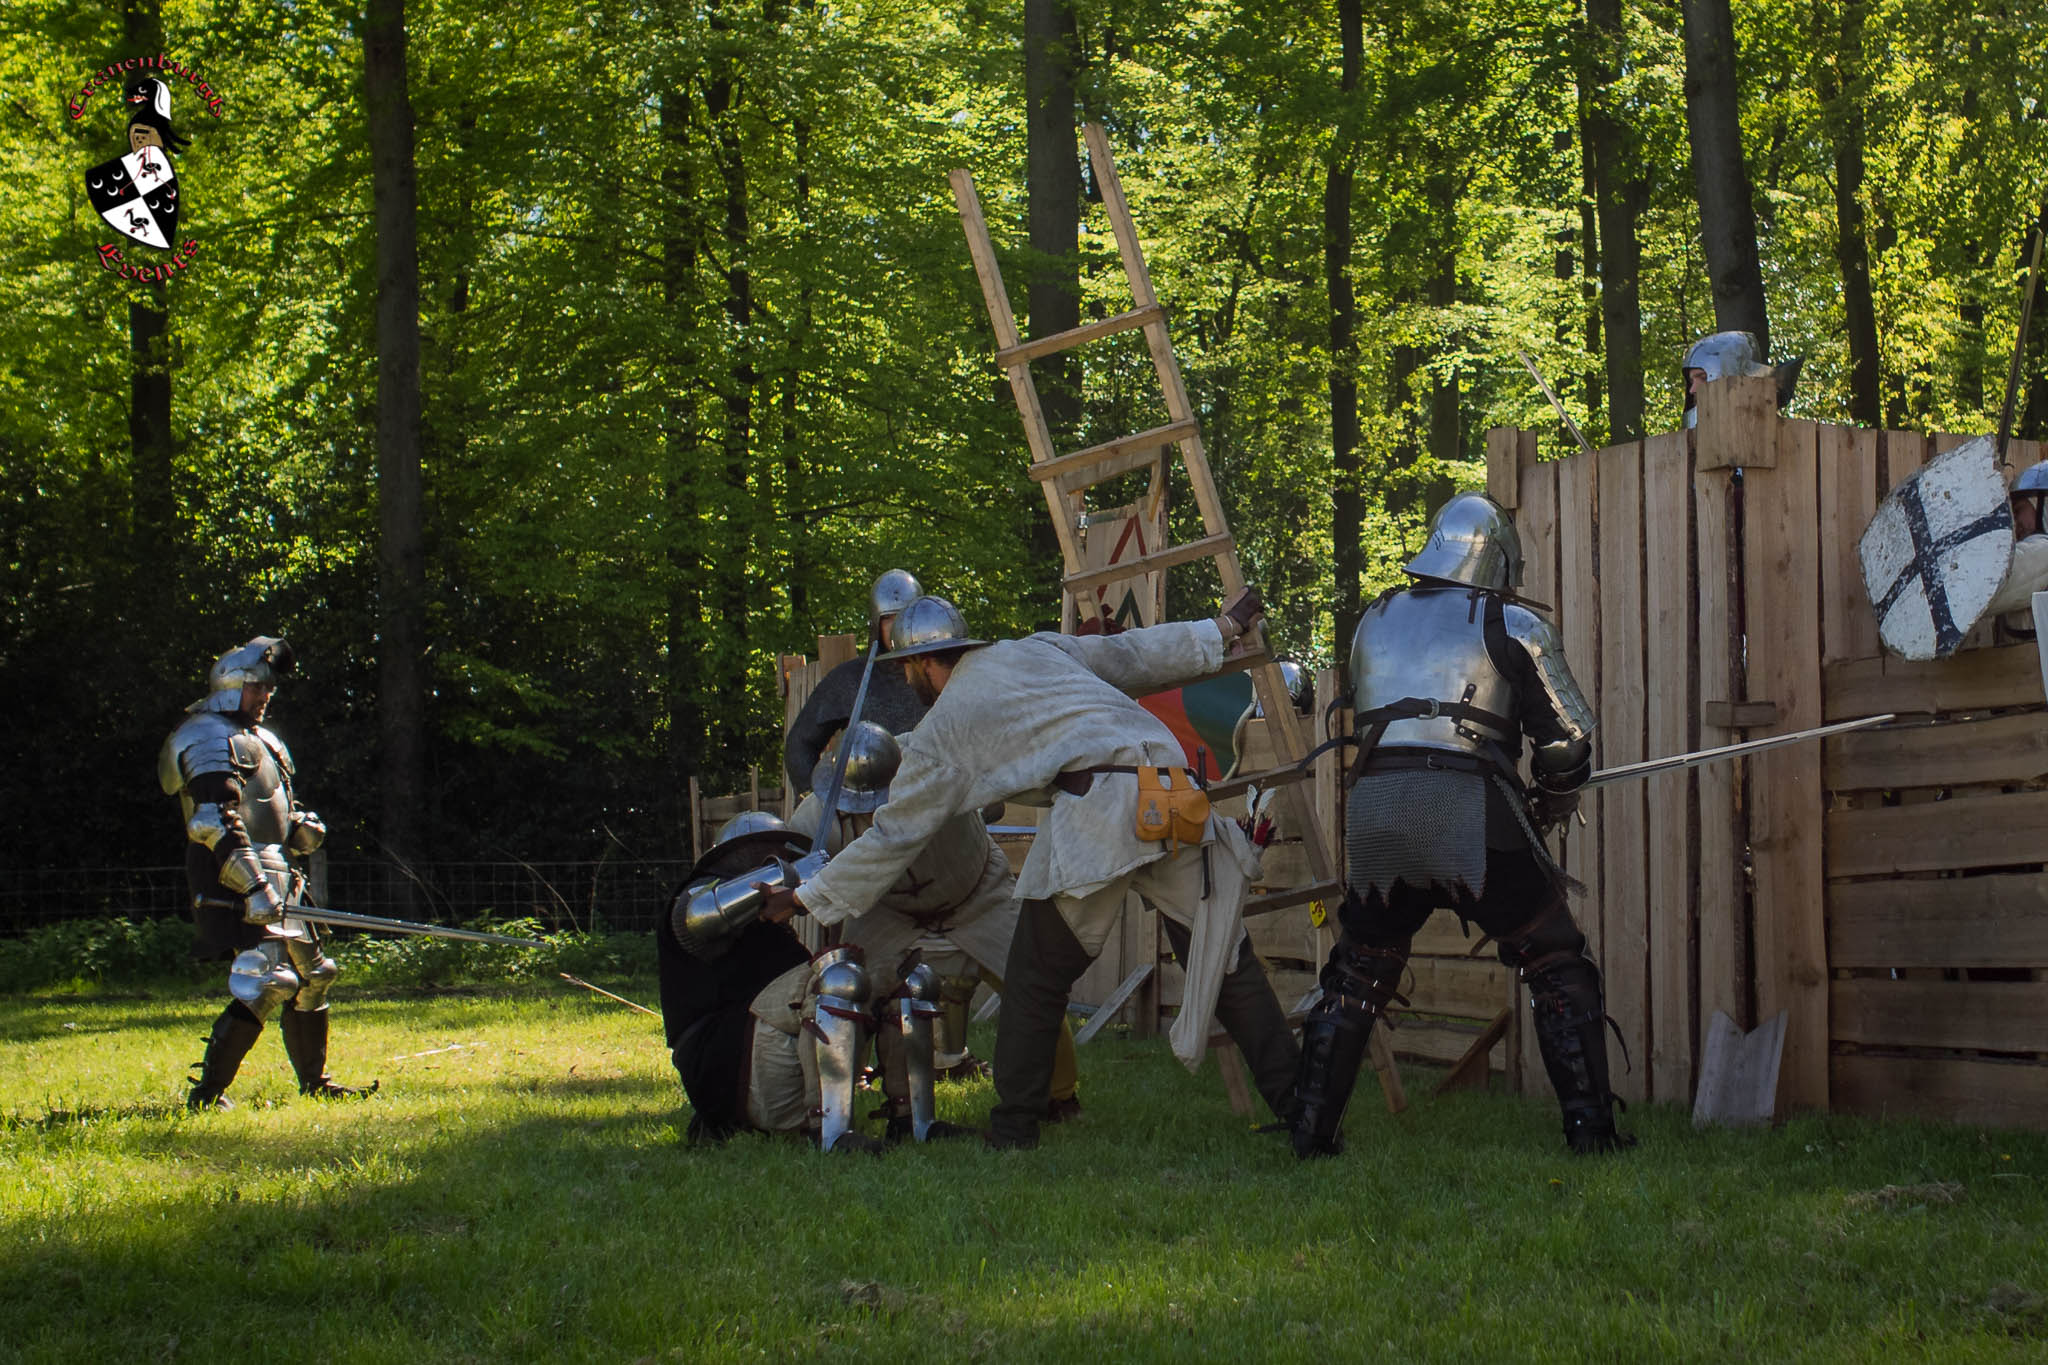 Middeleeuws-Festijn-Cannenburgh-2018-Algemeen-Ellen-la-Faille-43